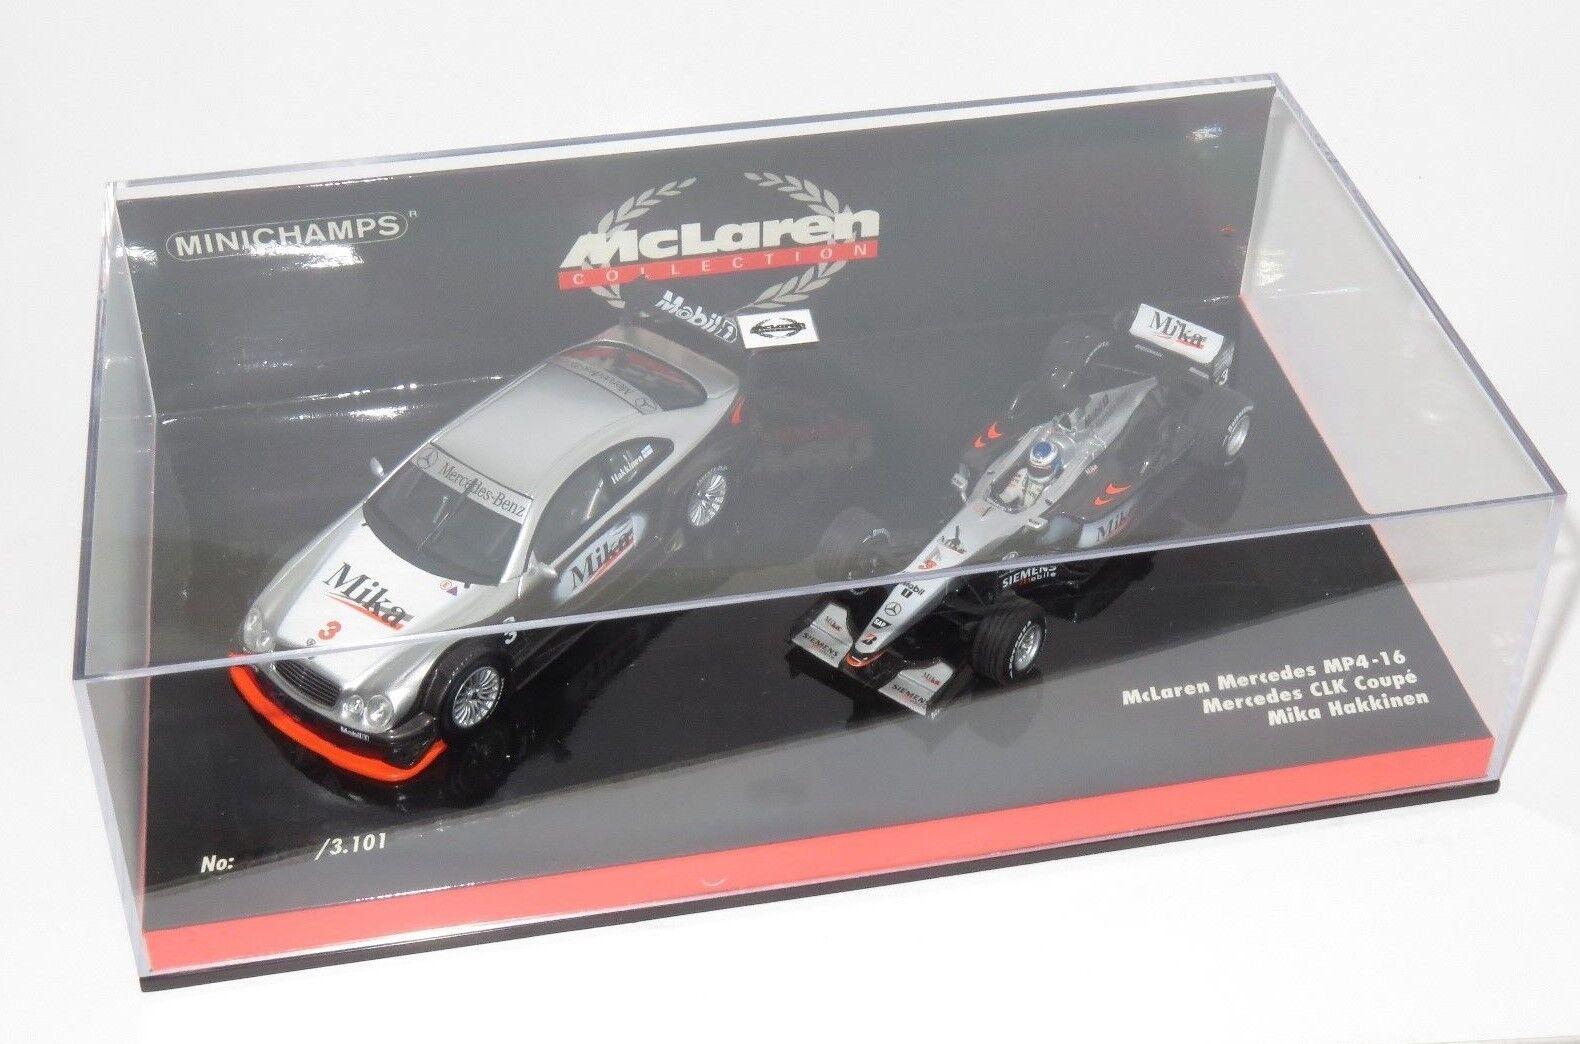 1/43 McLaren Mercedes MP4-16 y Mercedes CLK Coupe doble conjunto Mika obligaba